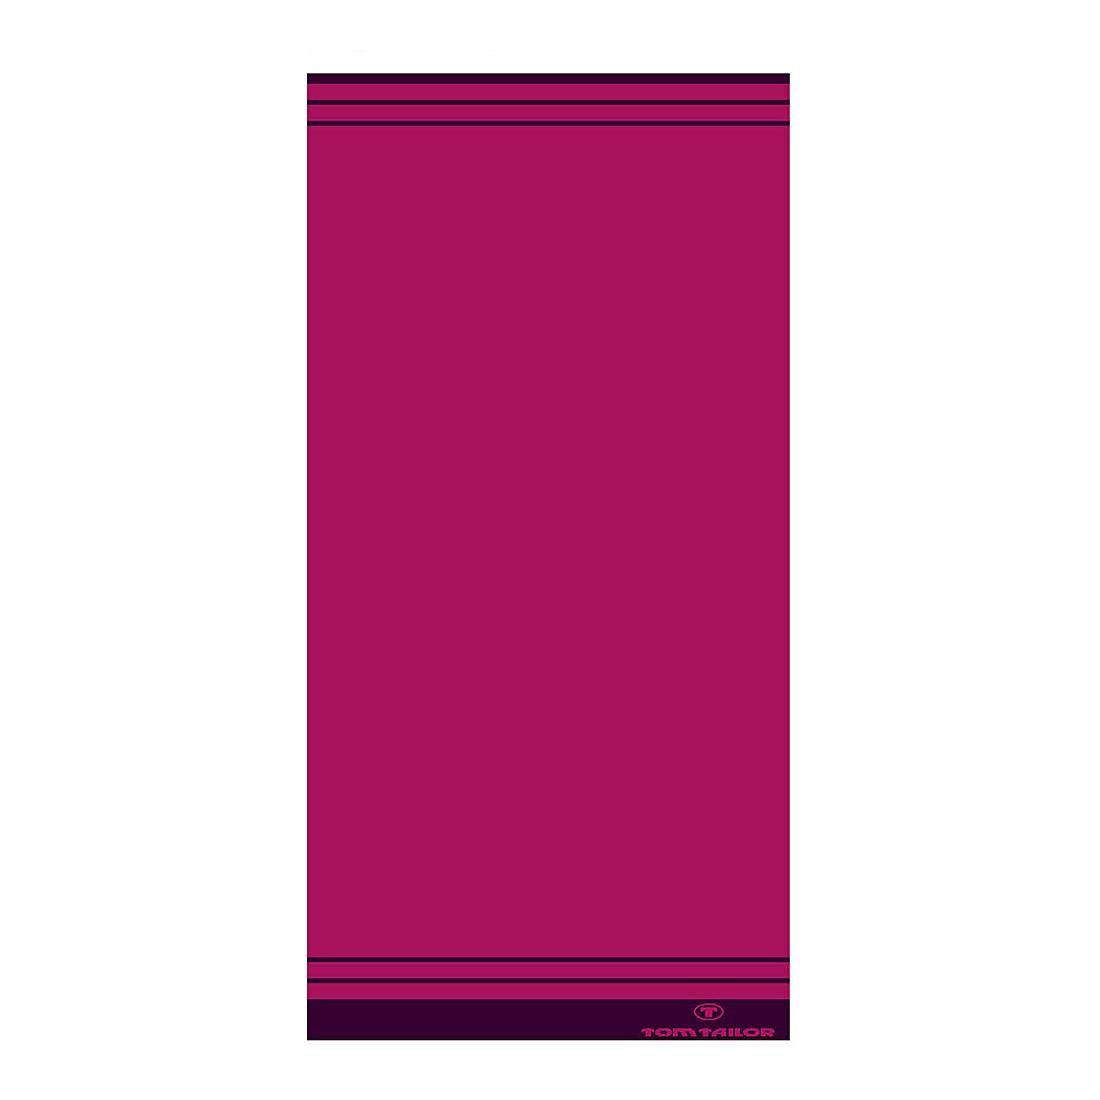 Handtuch Wellness Walk-Frottier II – Pink – Handtuch: 50 x 100 cm, Tom Tailor günstig